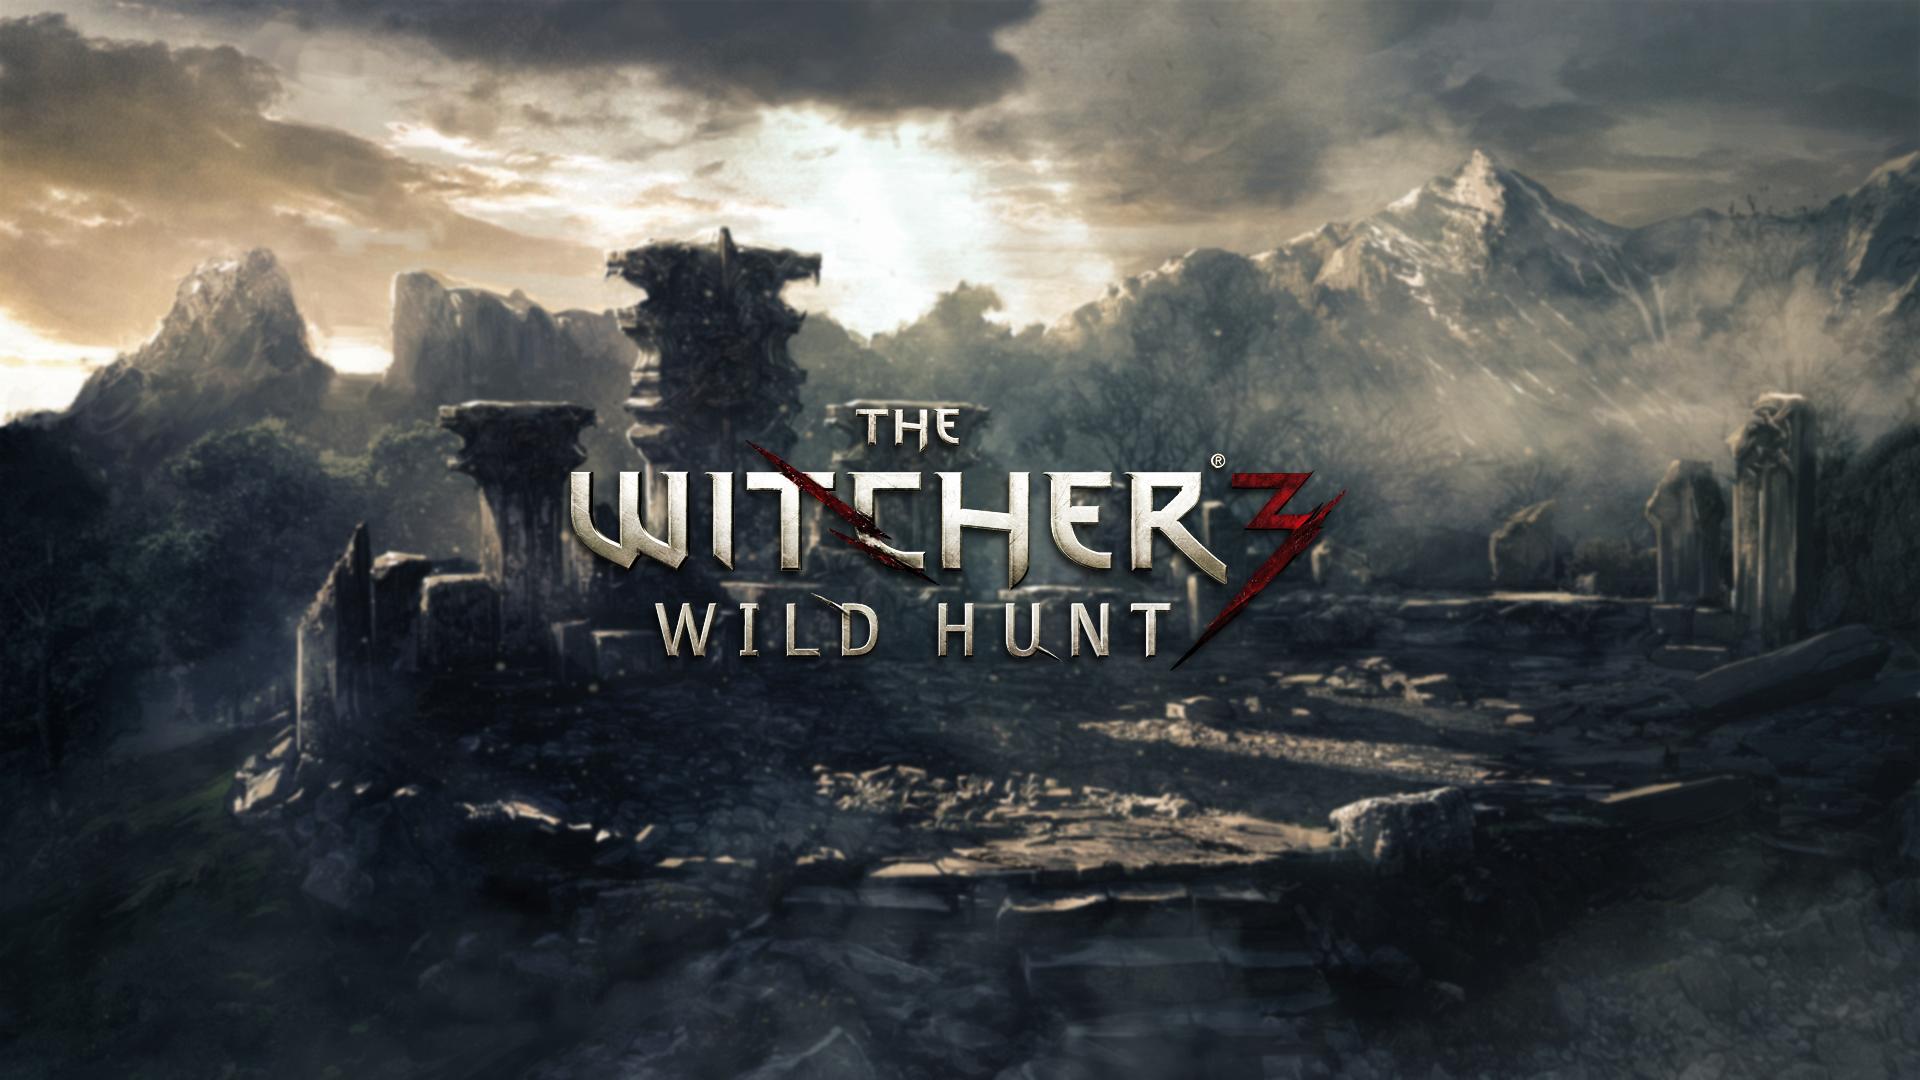 The Witcher 3 Wild Hunt Wallpaper By Ramzes100 On Deviantart